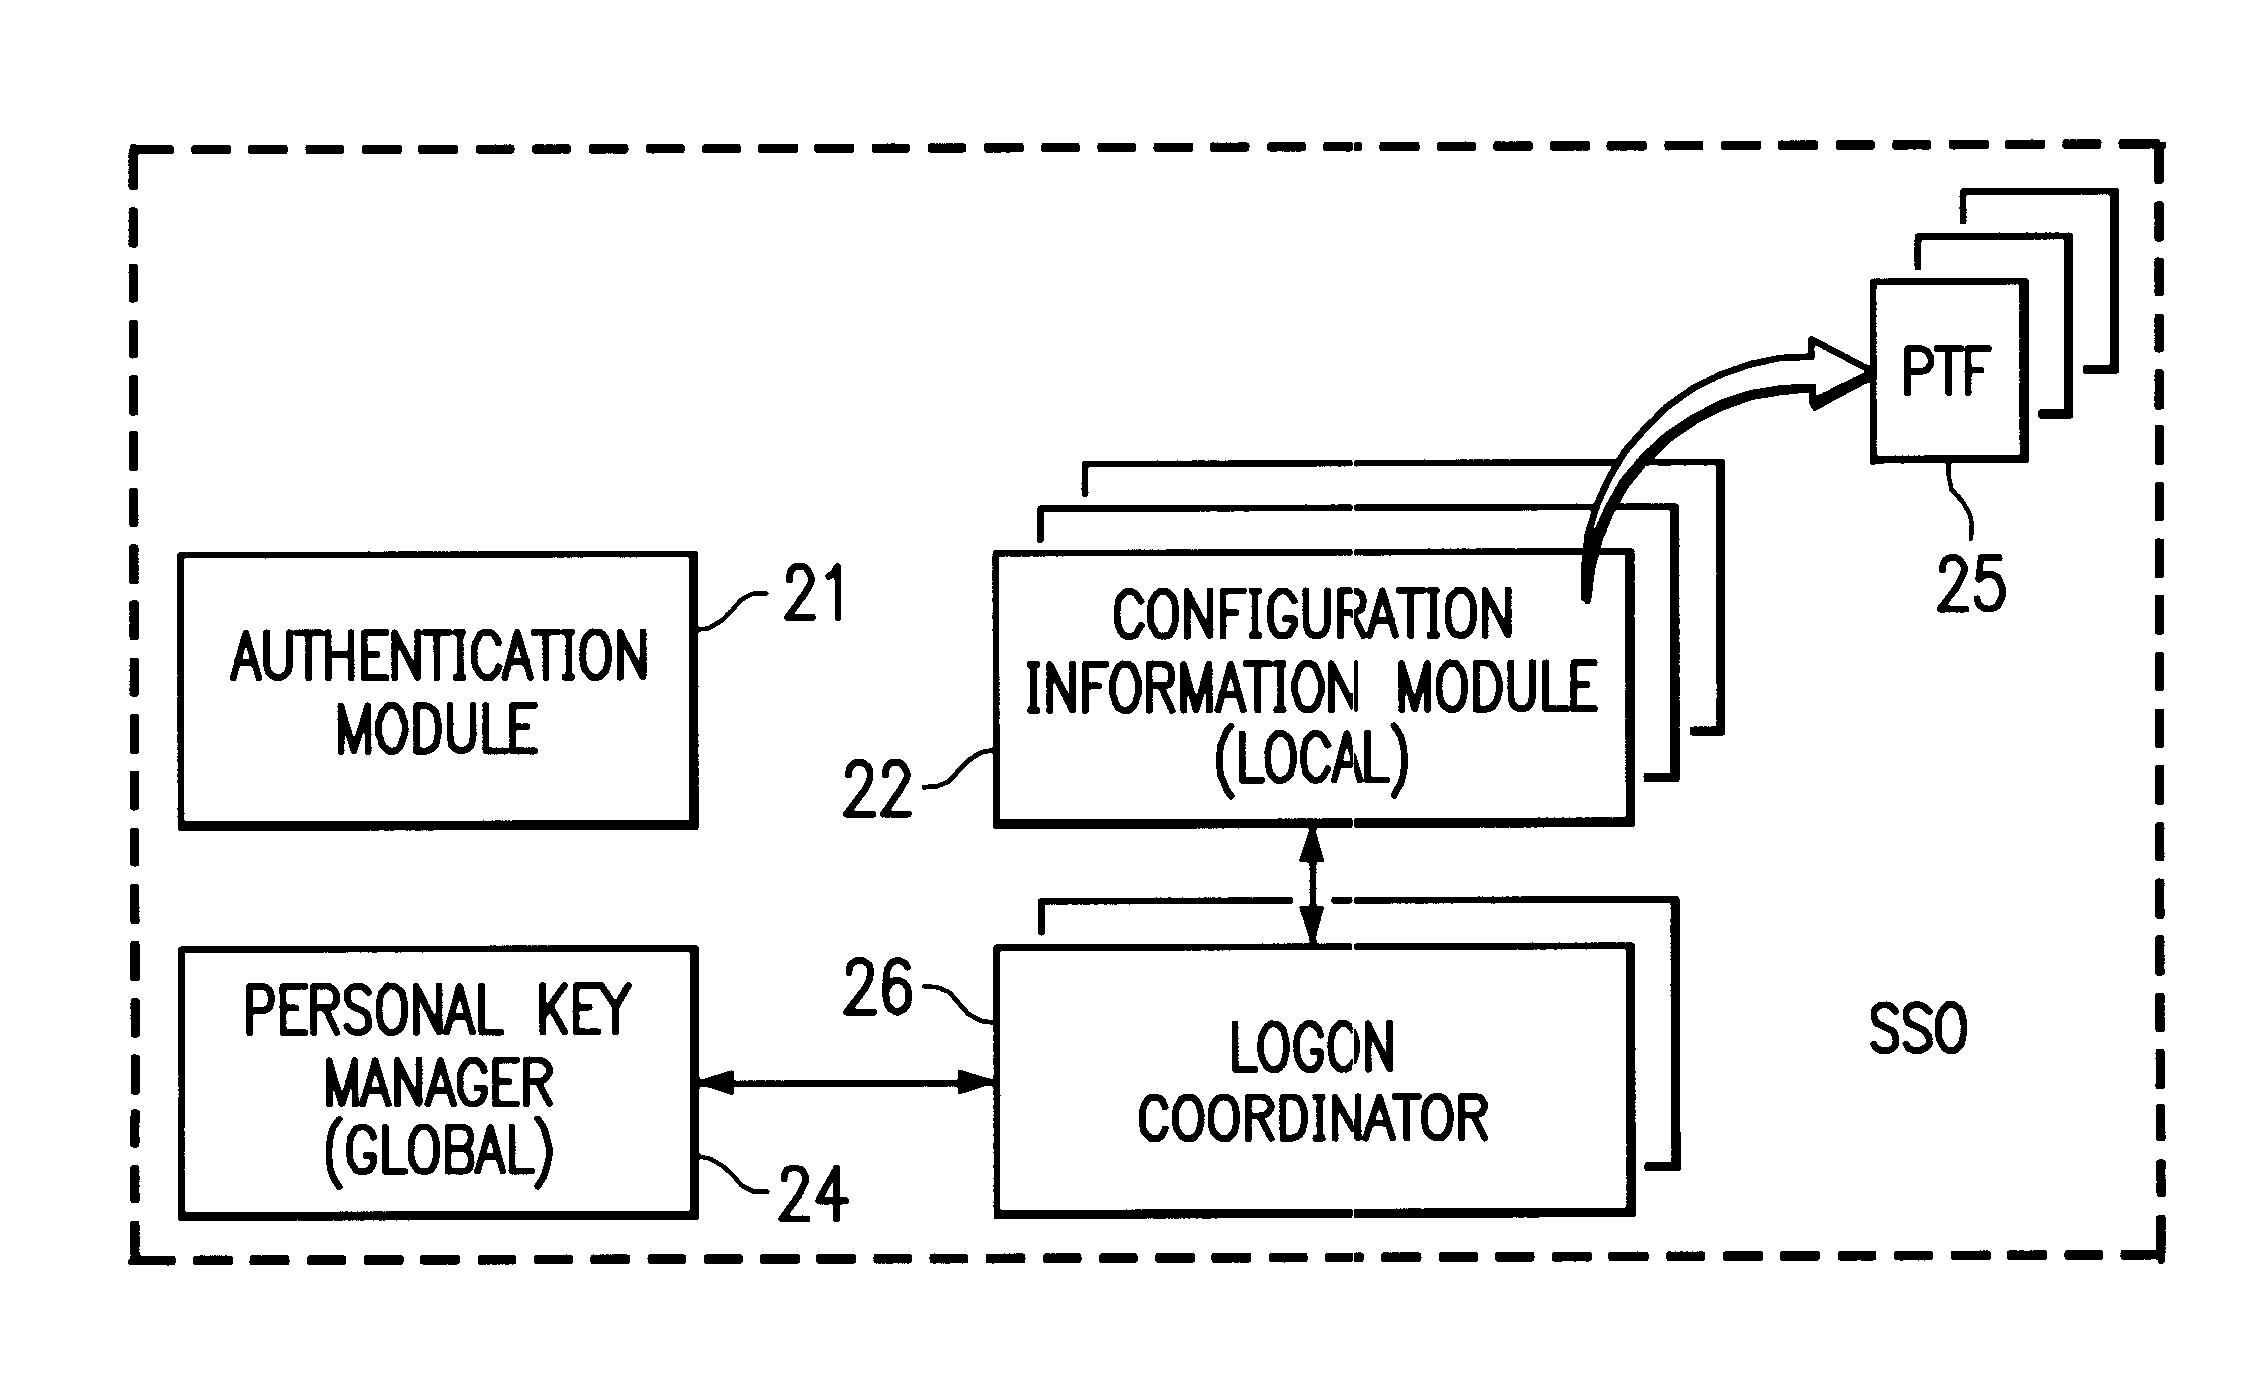 Patent US 6,243,816 B1